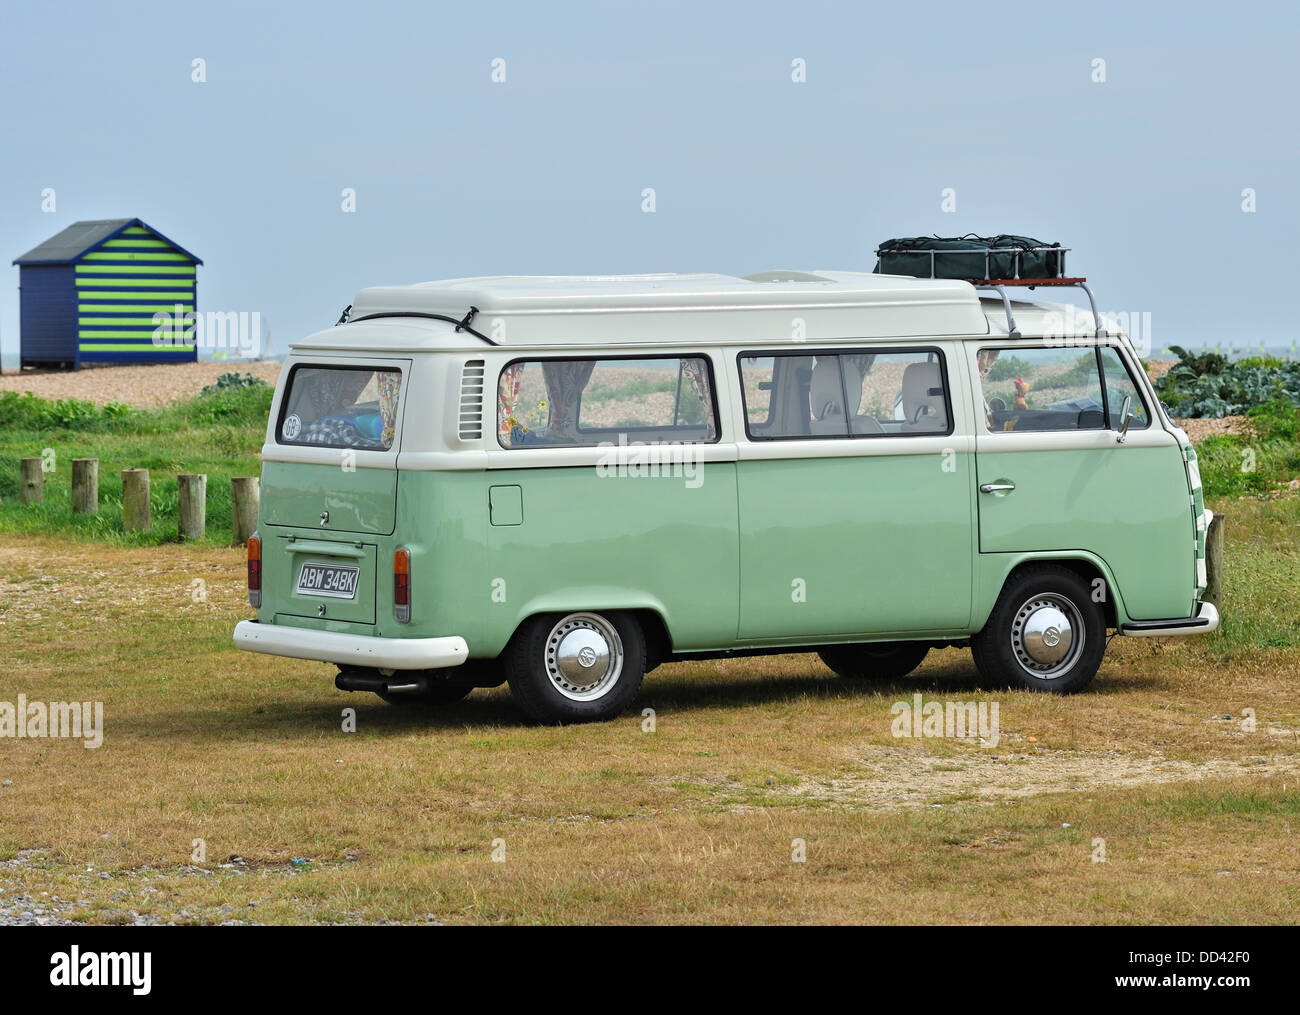 VW CAMPER VAN, Hayling Island, Hampshire, Reino Unido Foto de stock